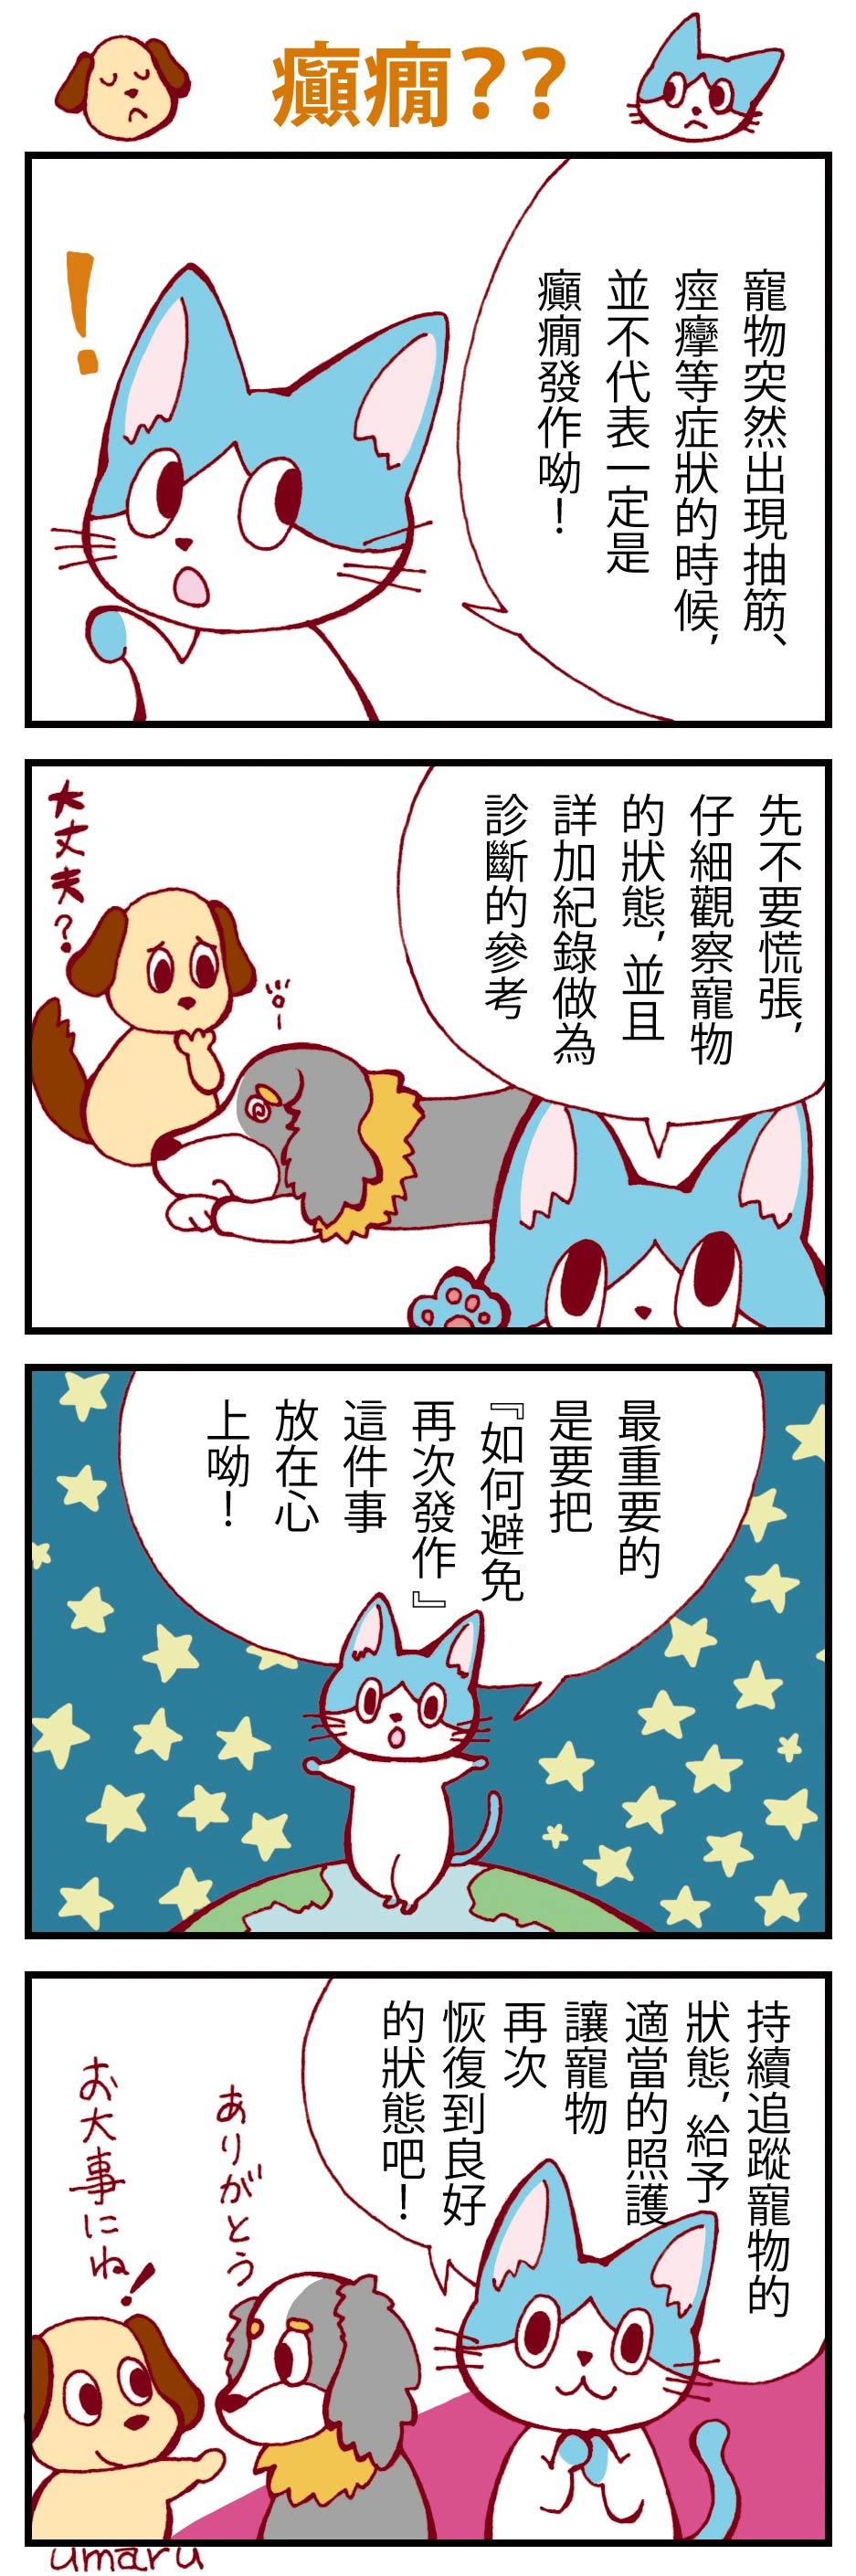 kichikichi_4koma_tenkan.jpg